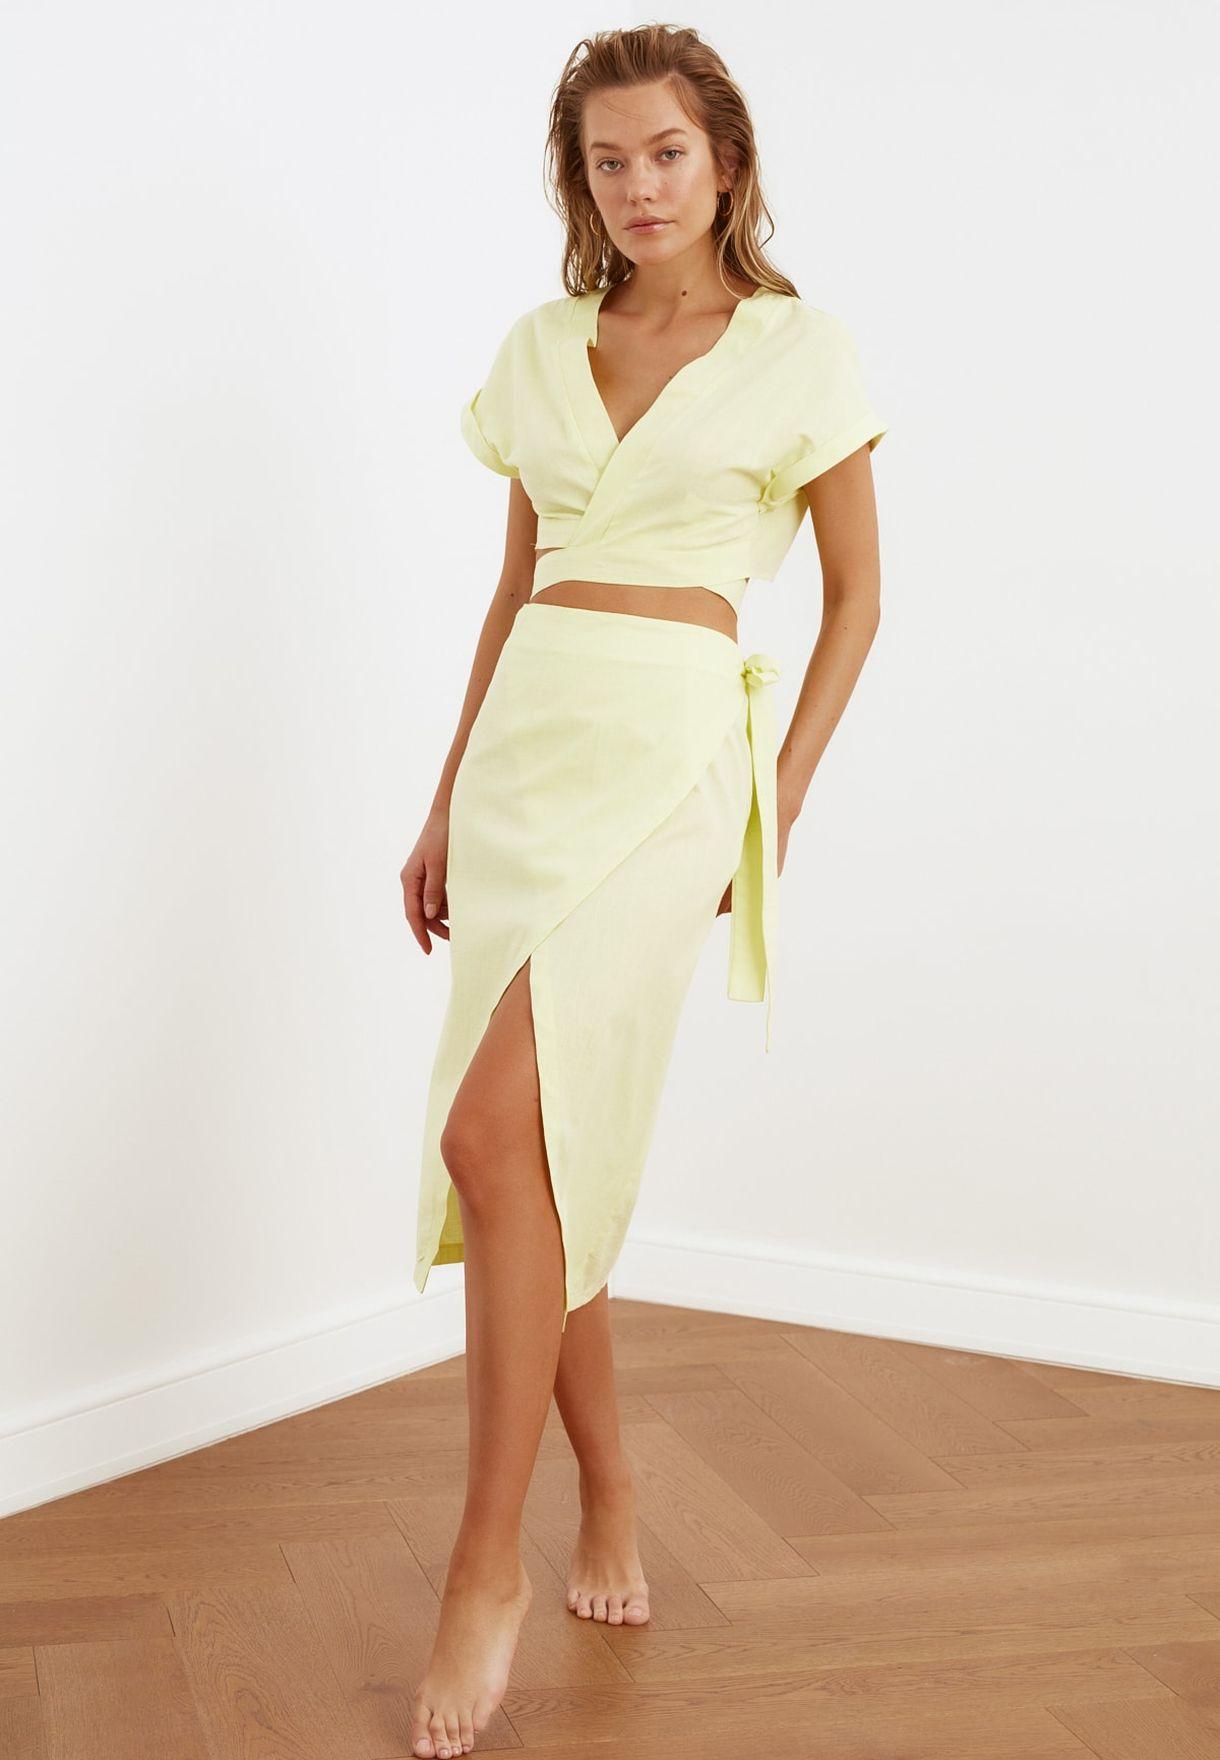 Broderie Detail Wrap Top & Skirt Set